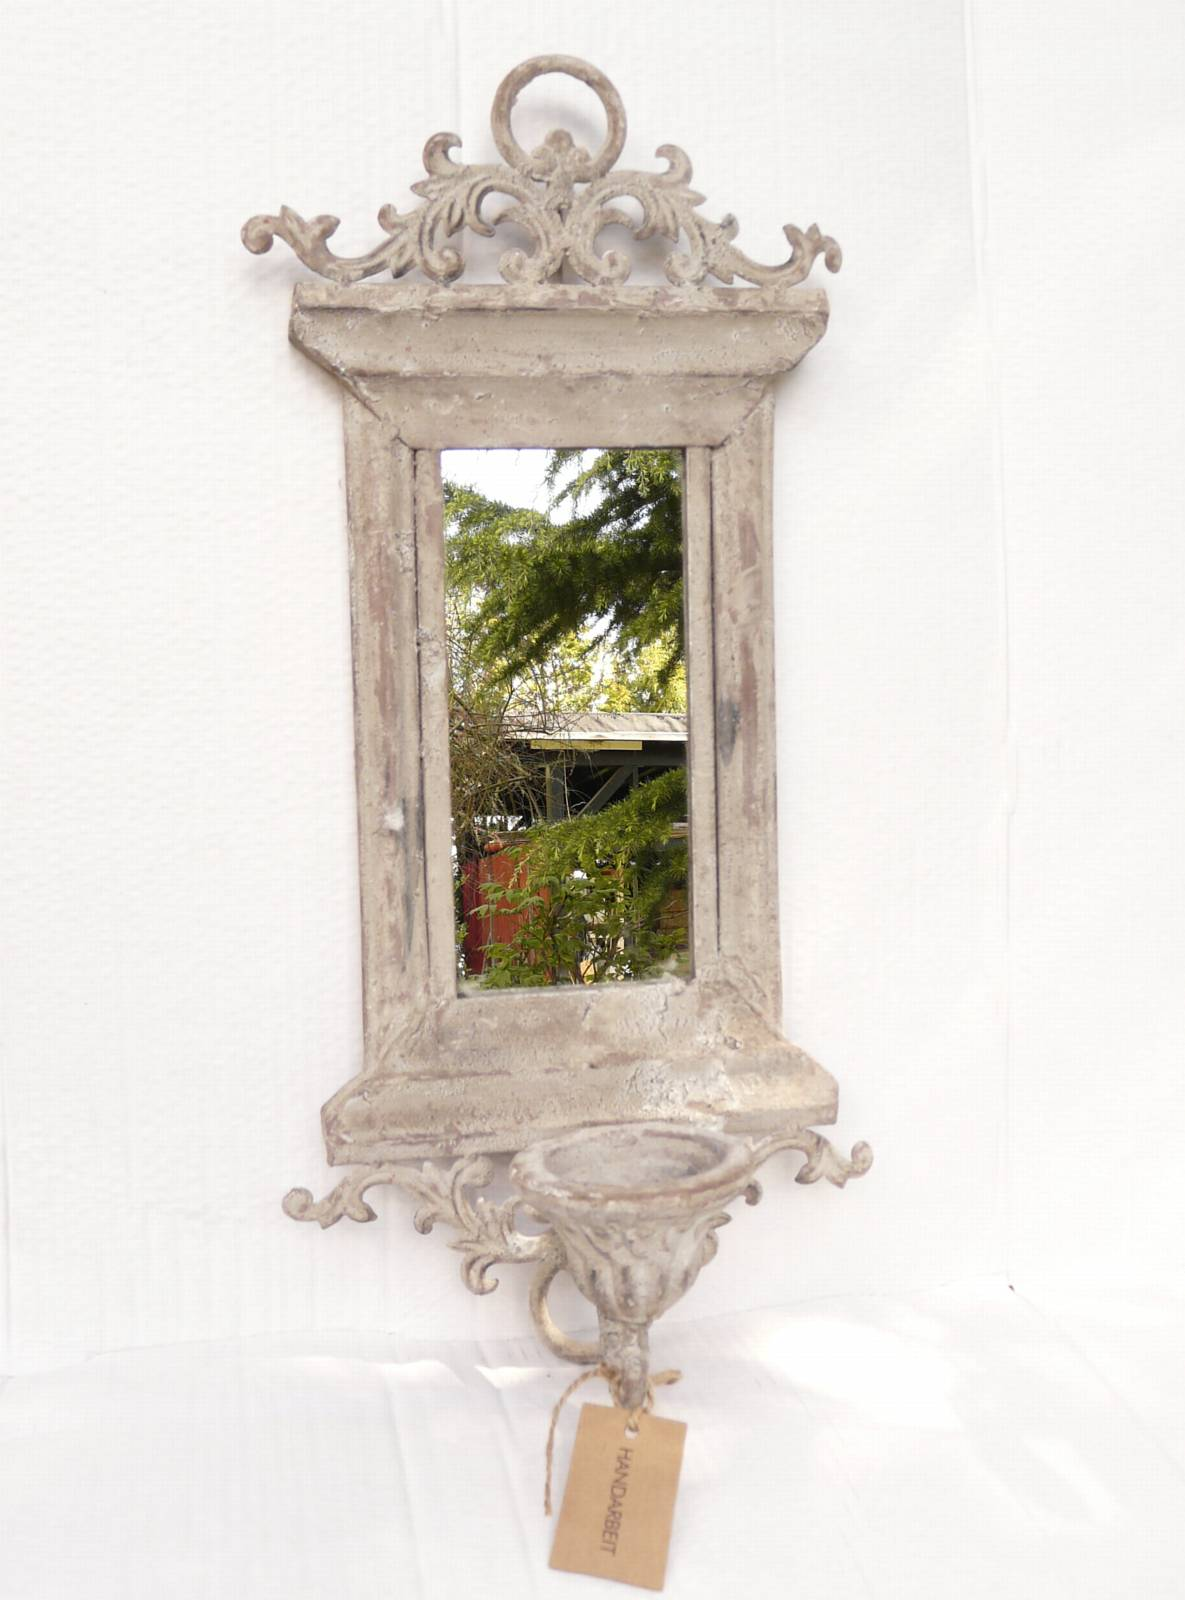 kerzenhalter wandkerzenhalter kerzenleuchter metall mit spiegel shabby chic. Black Bedroom Furniture Sets. Home Design Ideas